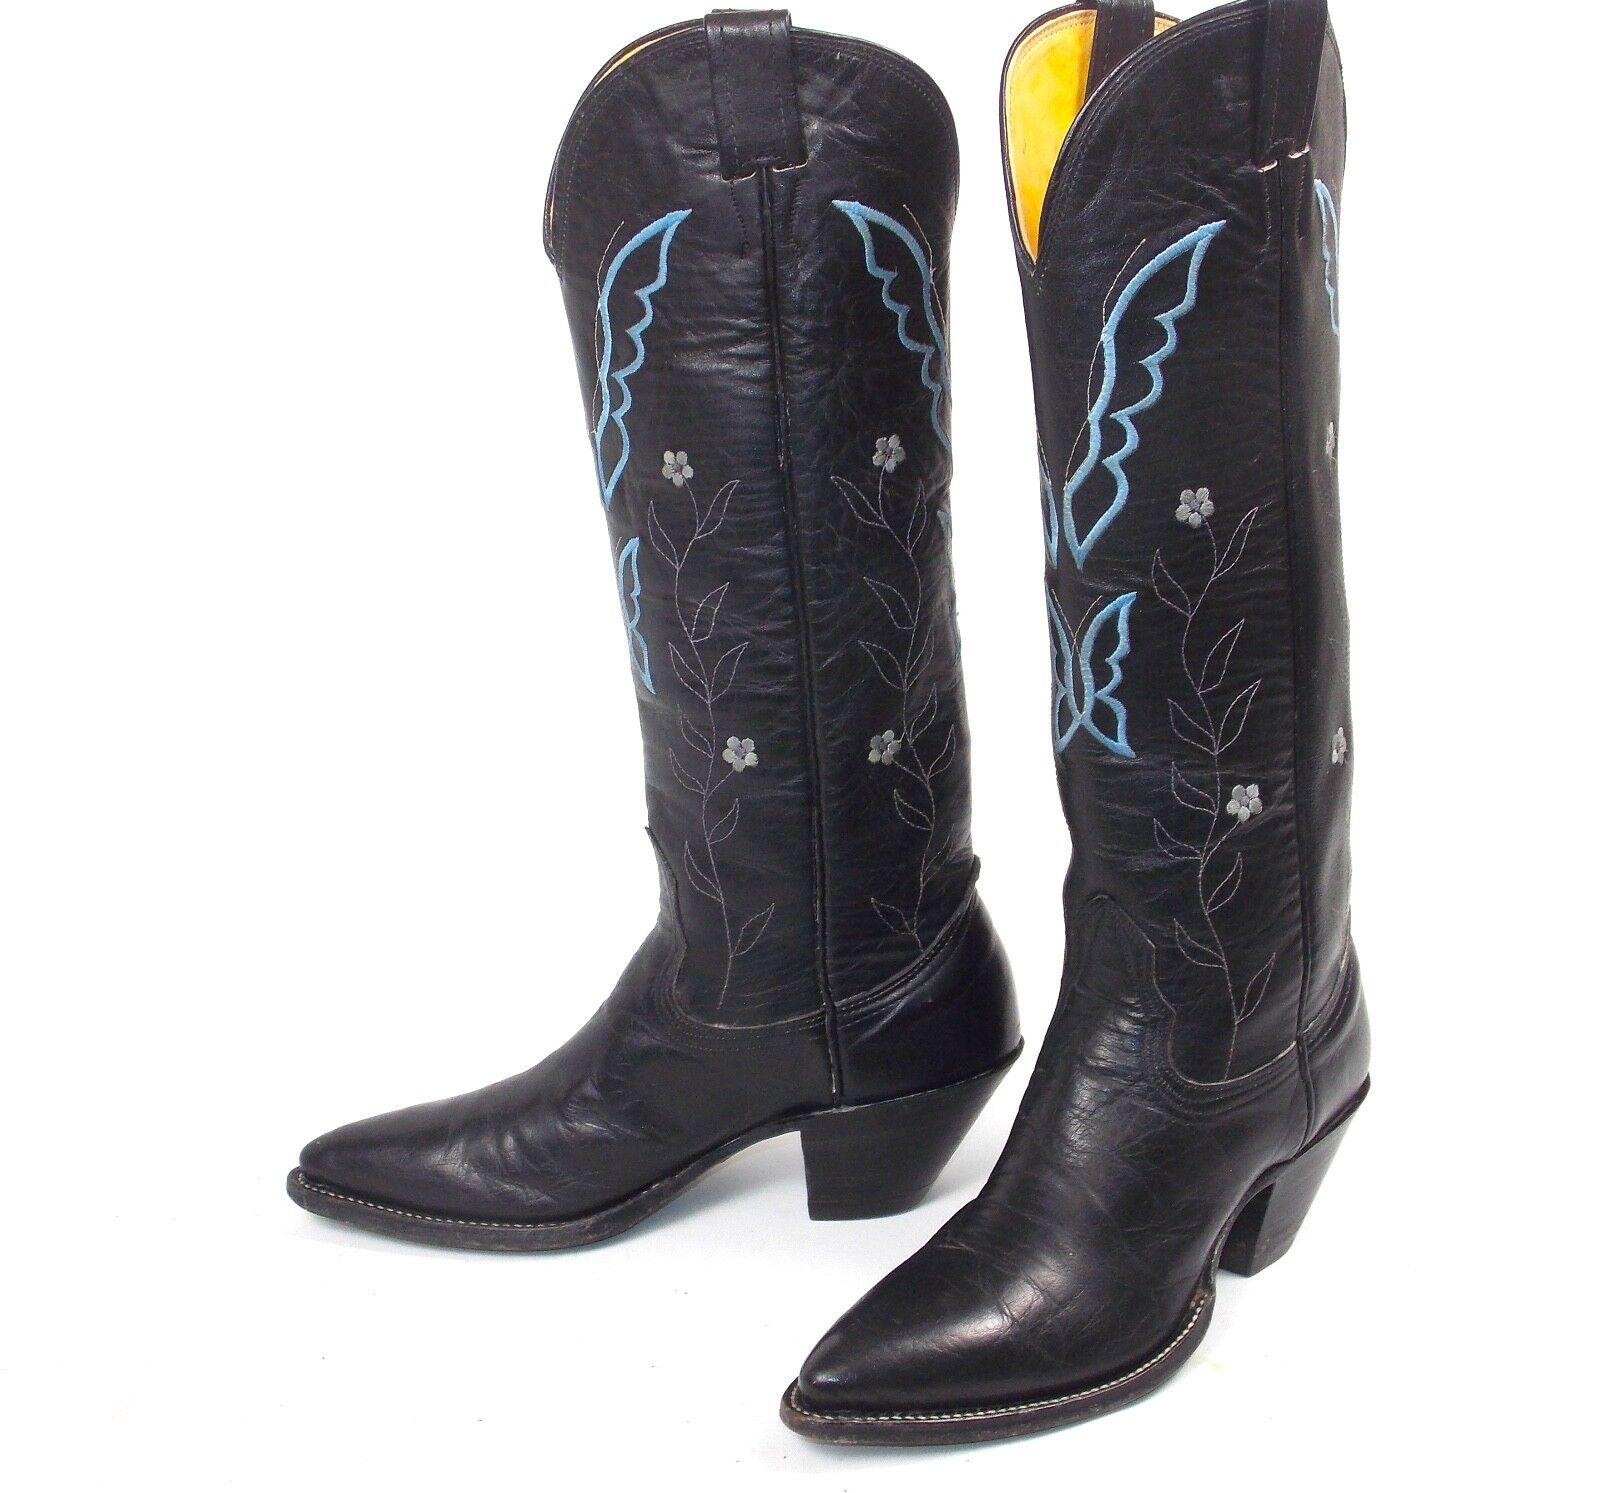 disponibile Nocona Tall nero Cowboy stivali - Donna  Sz 6.5B 6.5B 6.5B Tall Heels Plain Toes Kangaroo  vendita outlet